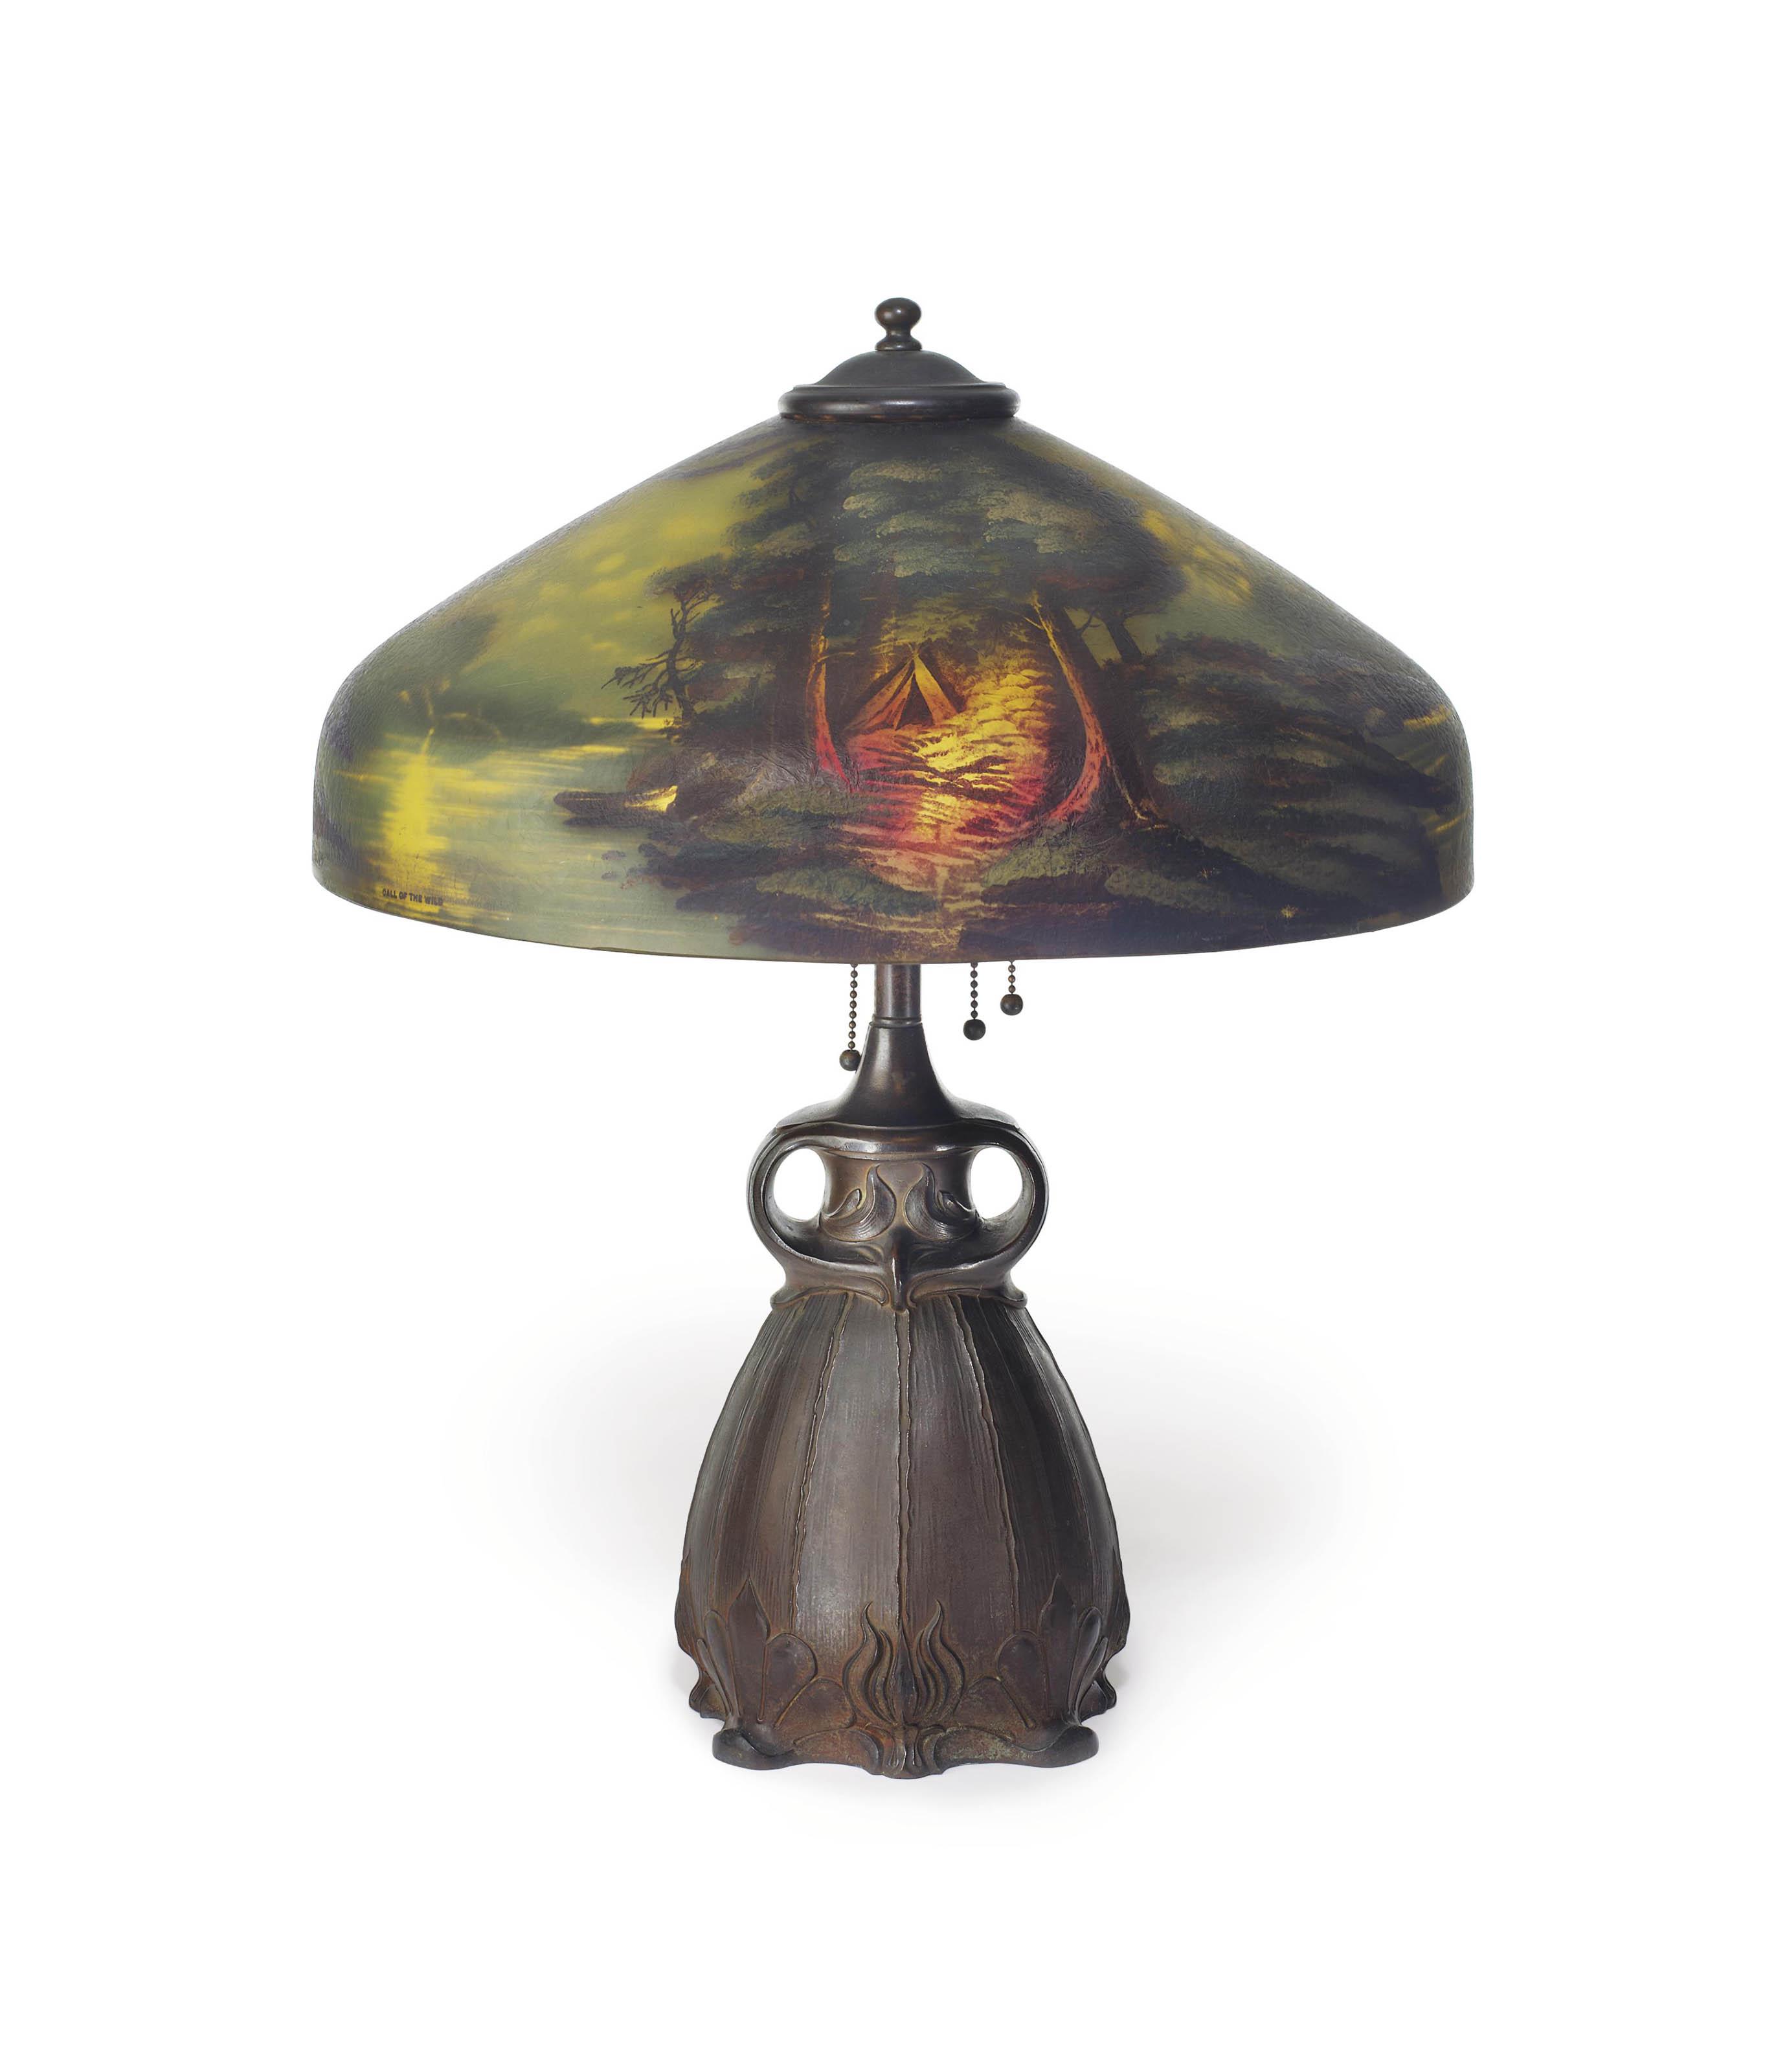 PITTSBURGH LAMP, BRASS & GLASS